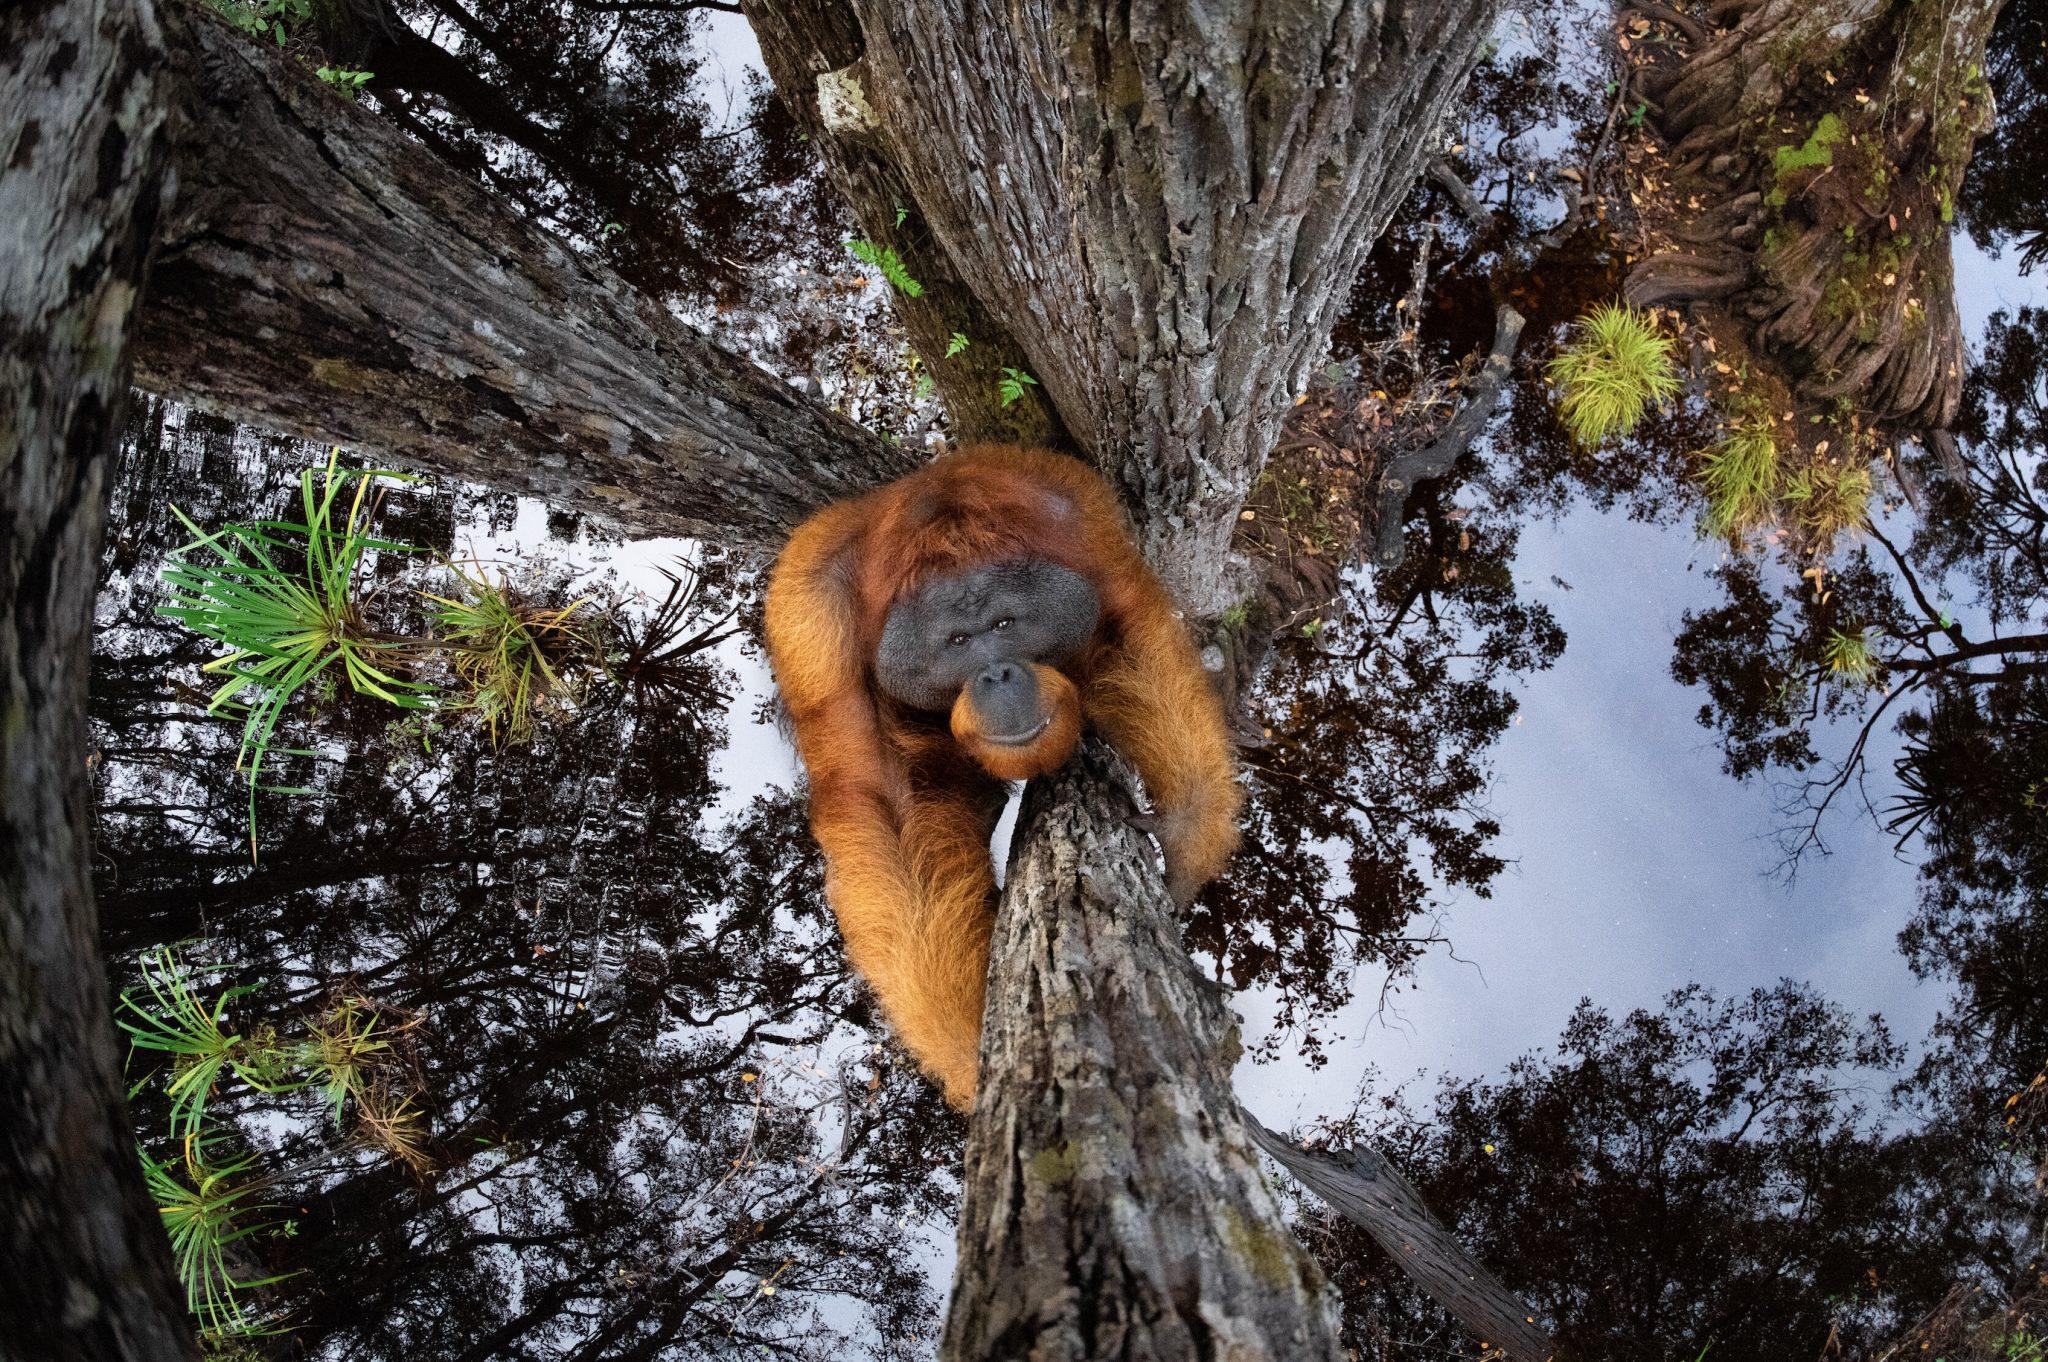 Thomas Vijayan Wins Nature TTL Photographer of the Year 2021 | தாமஸ் விஜயன் 2021 ஆம் ஆண்டின் இயற்கை TTL புகைப்படக் கலைஞர் விருதை வென்றார் |_40.1